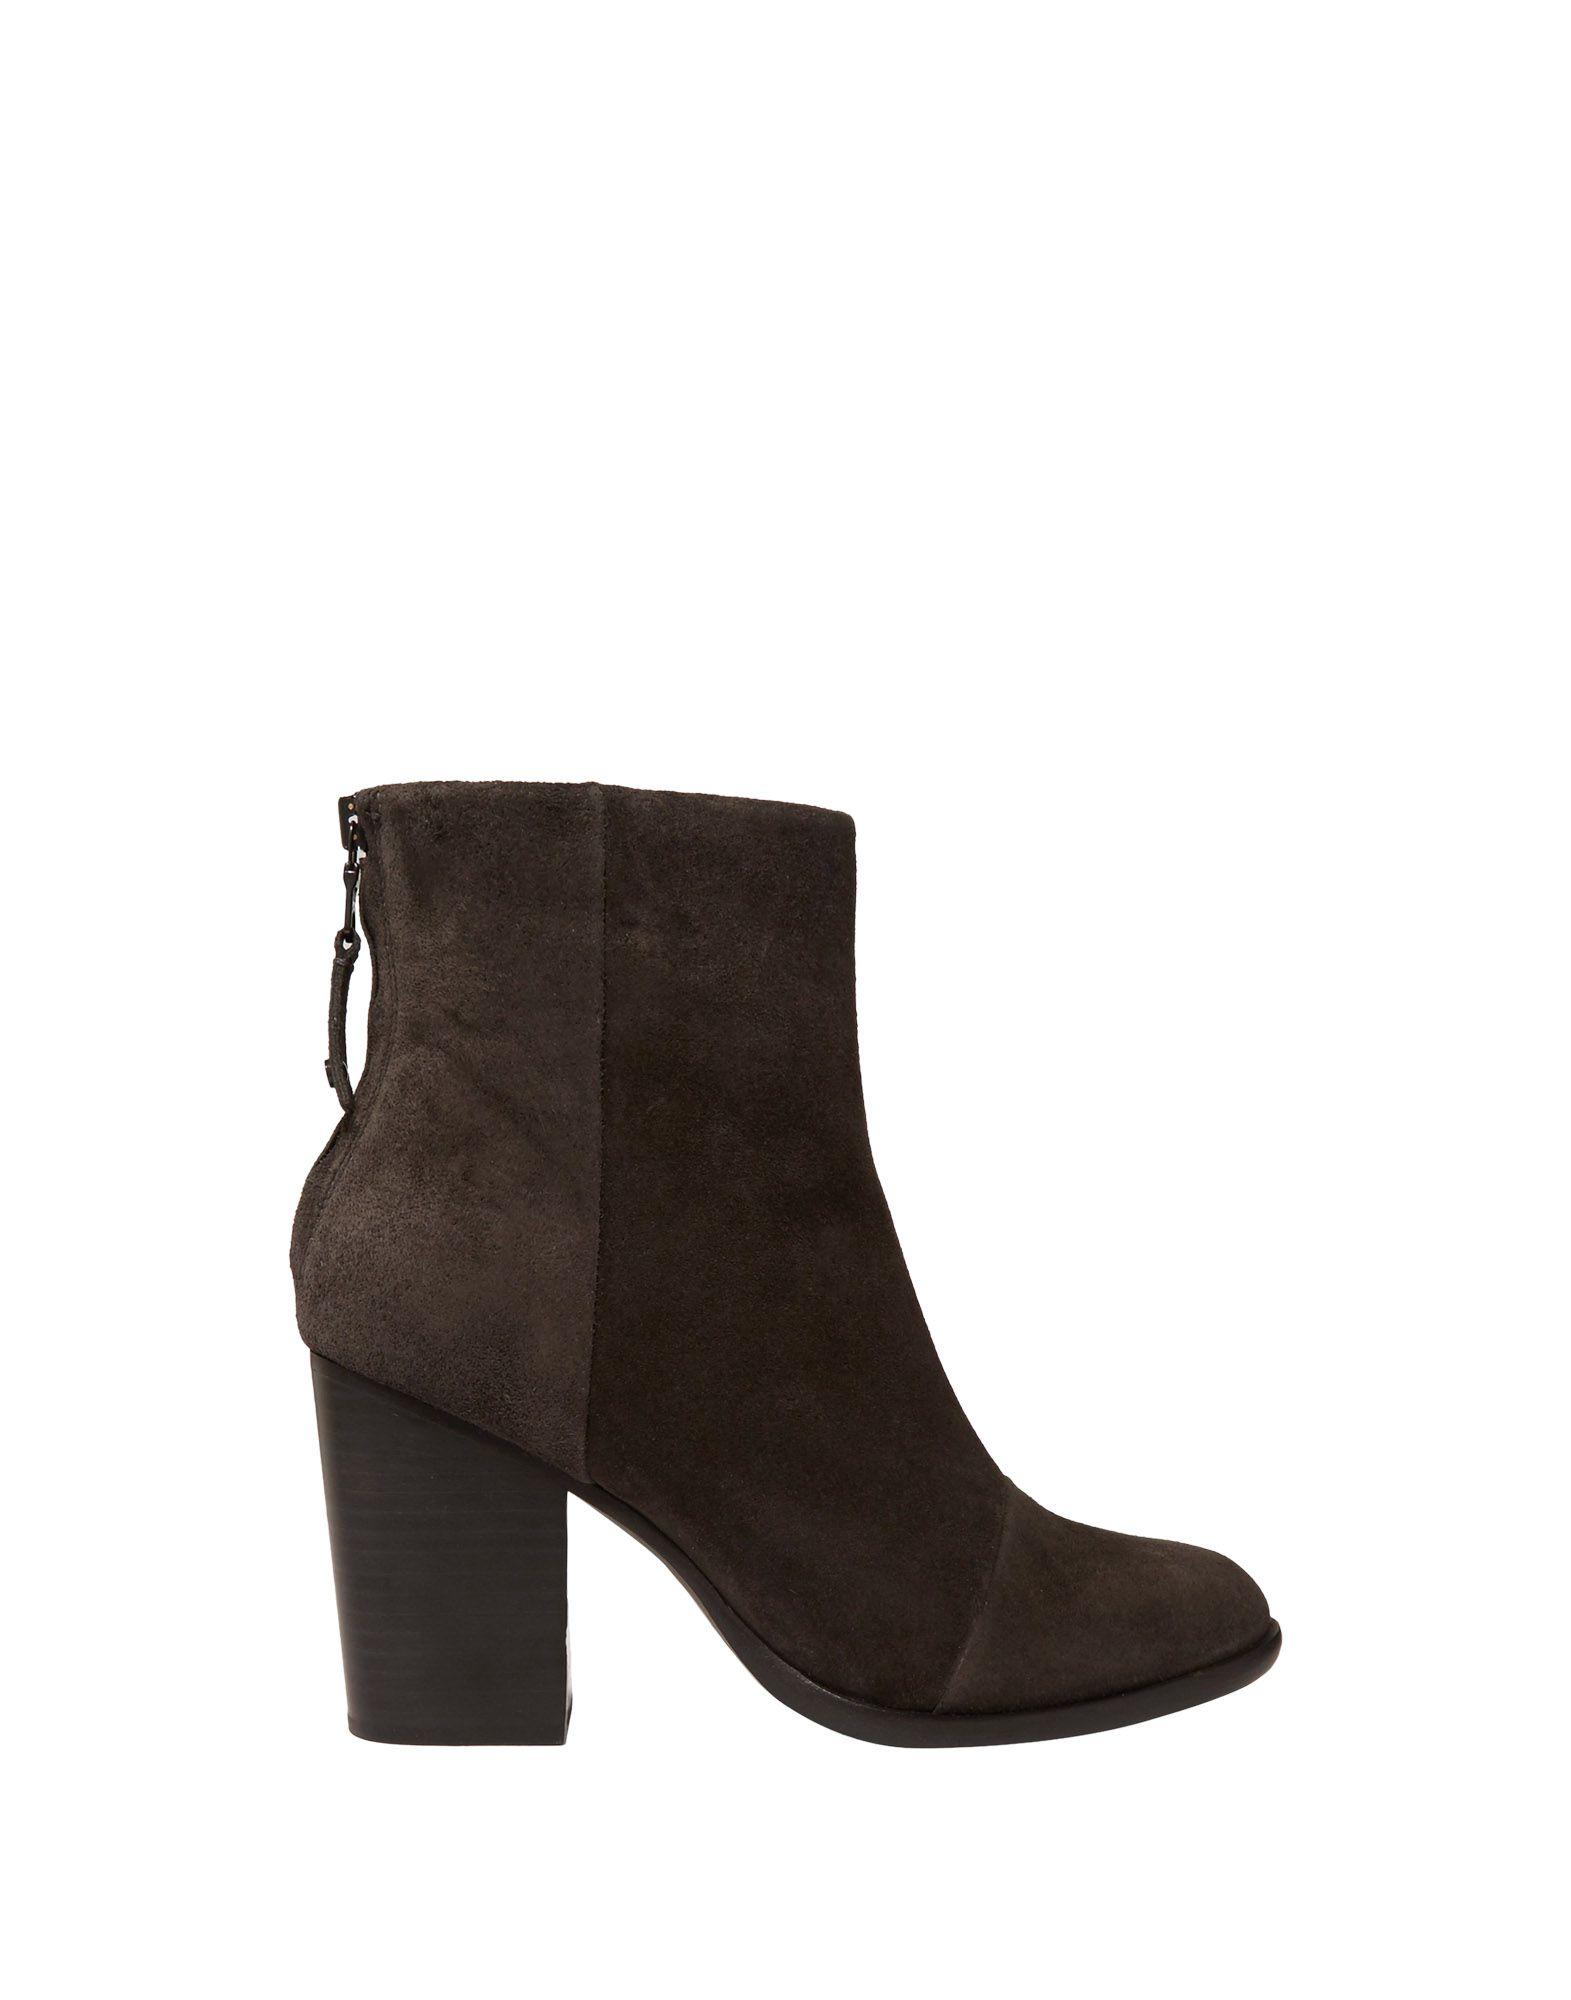 Rabatt Schuhe Rag & Bone Stiefelette Damen  11515765IQ